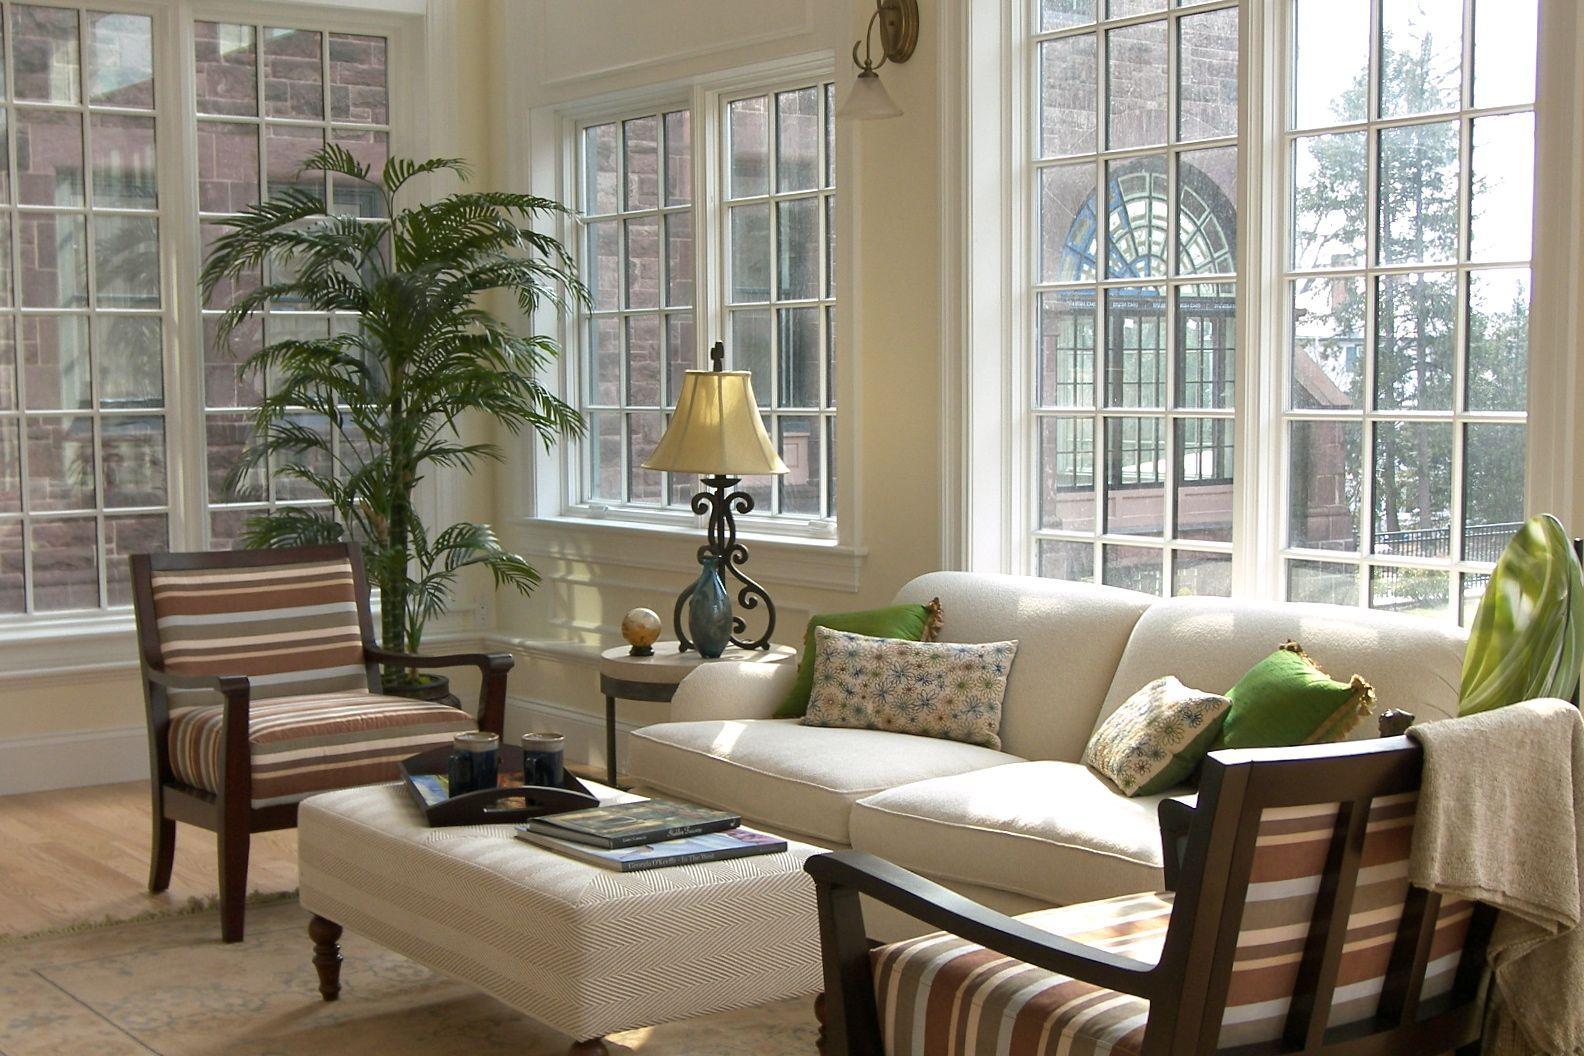 Upvc Windows Will Invite More Natural Light Inside The Room